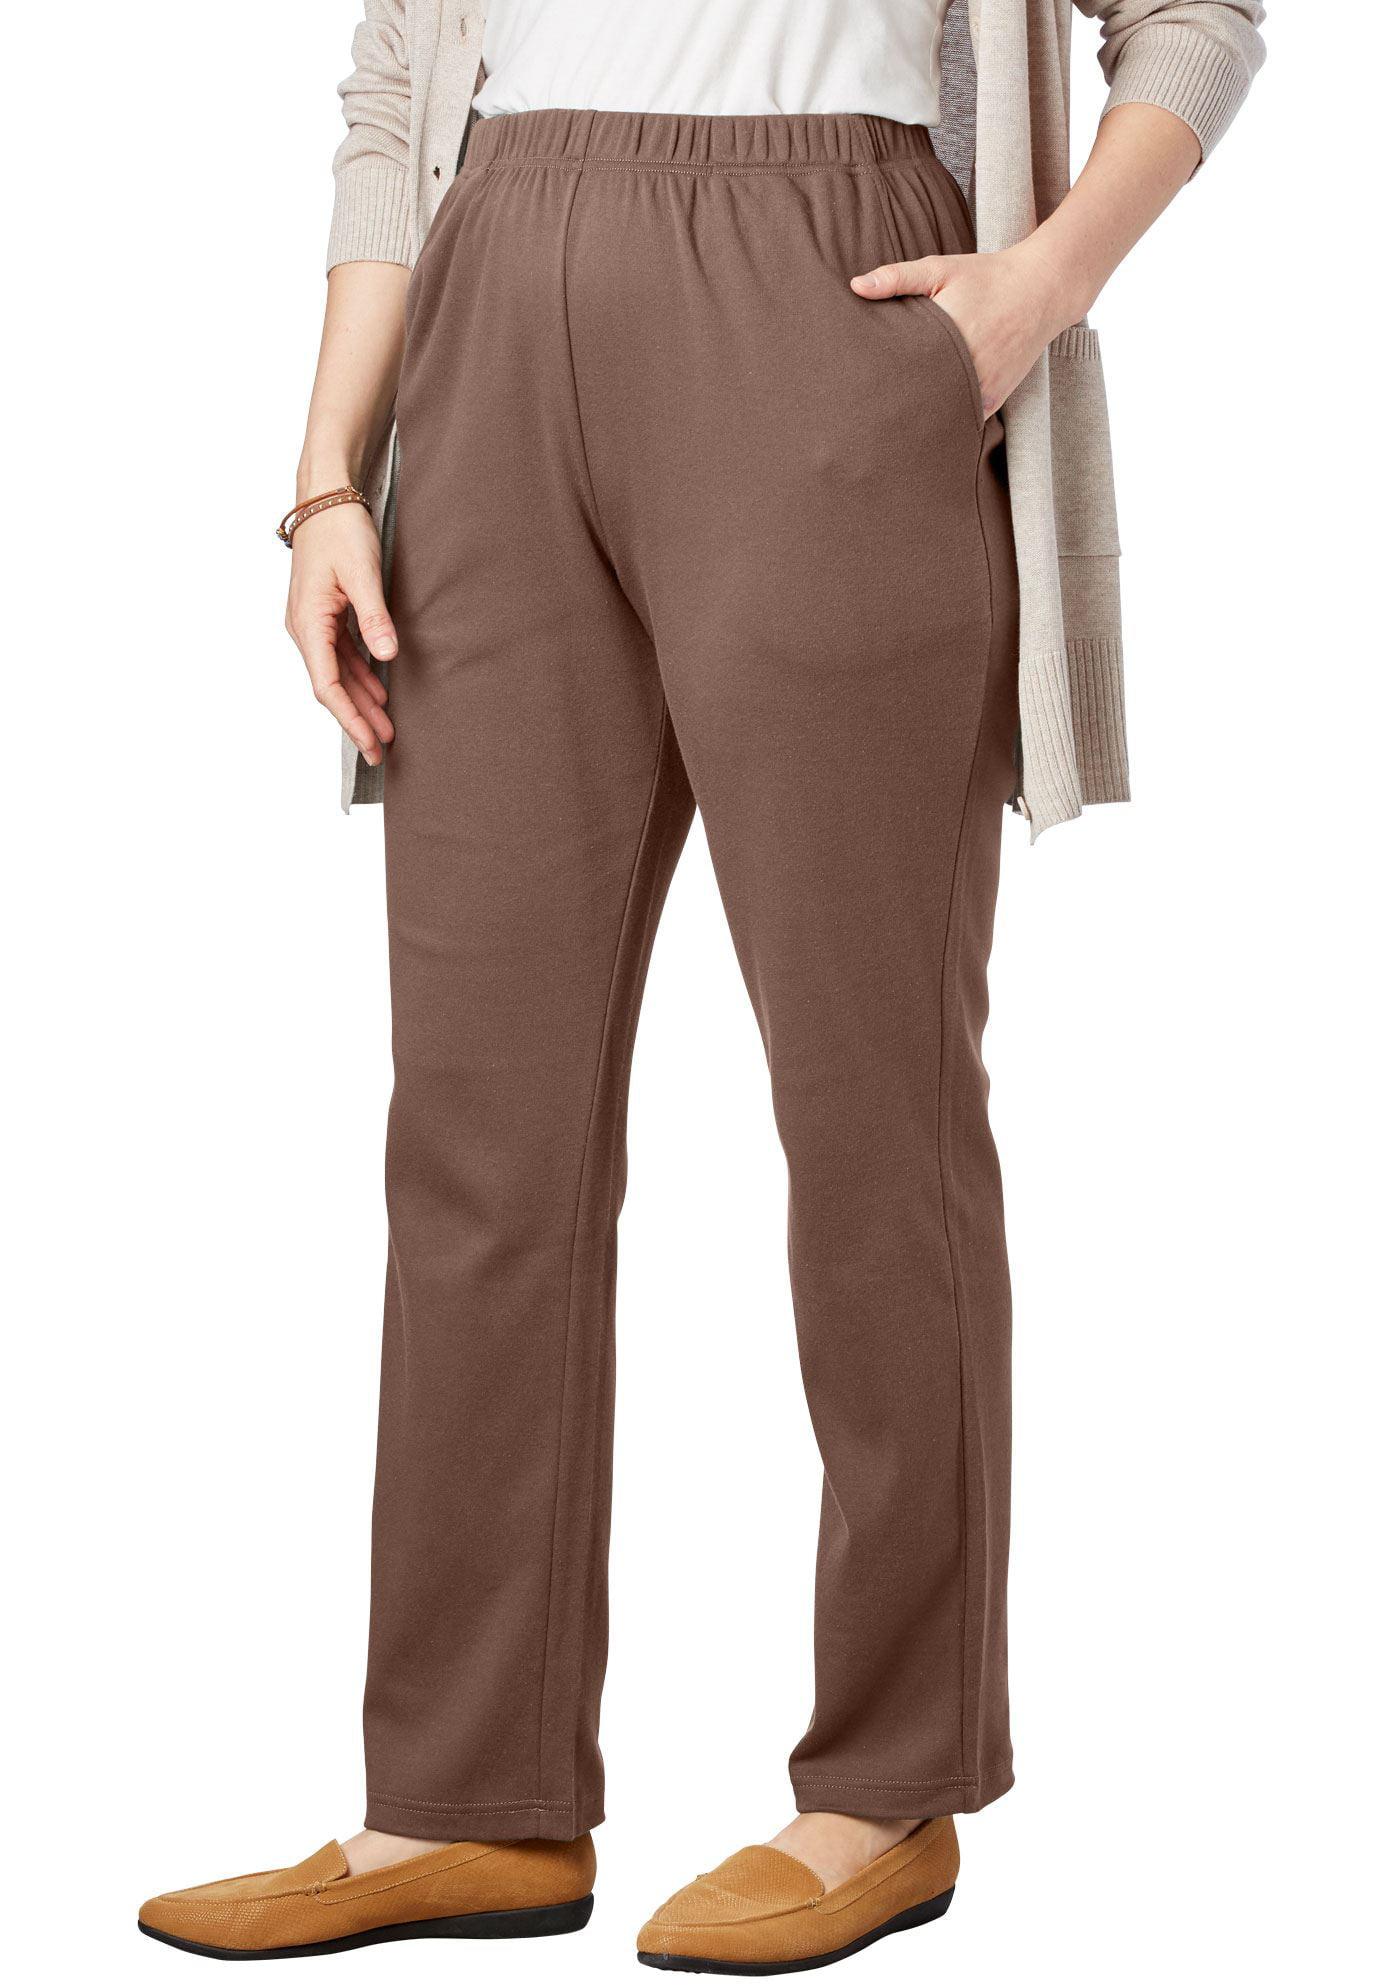 Woman Within Plus Size Petite 7-day Knit Straight Leg Pant